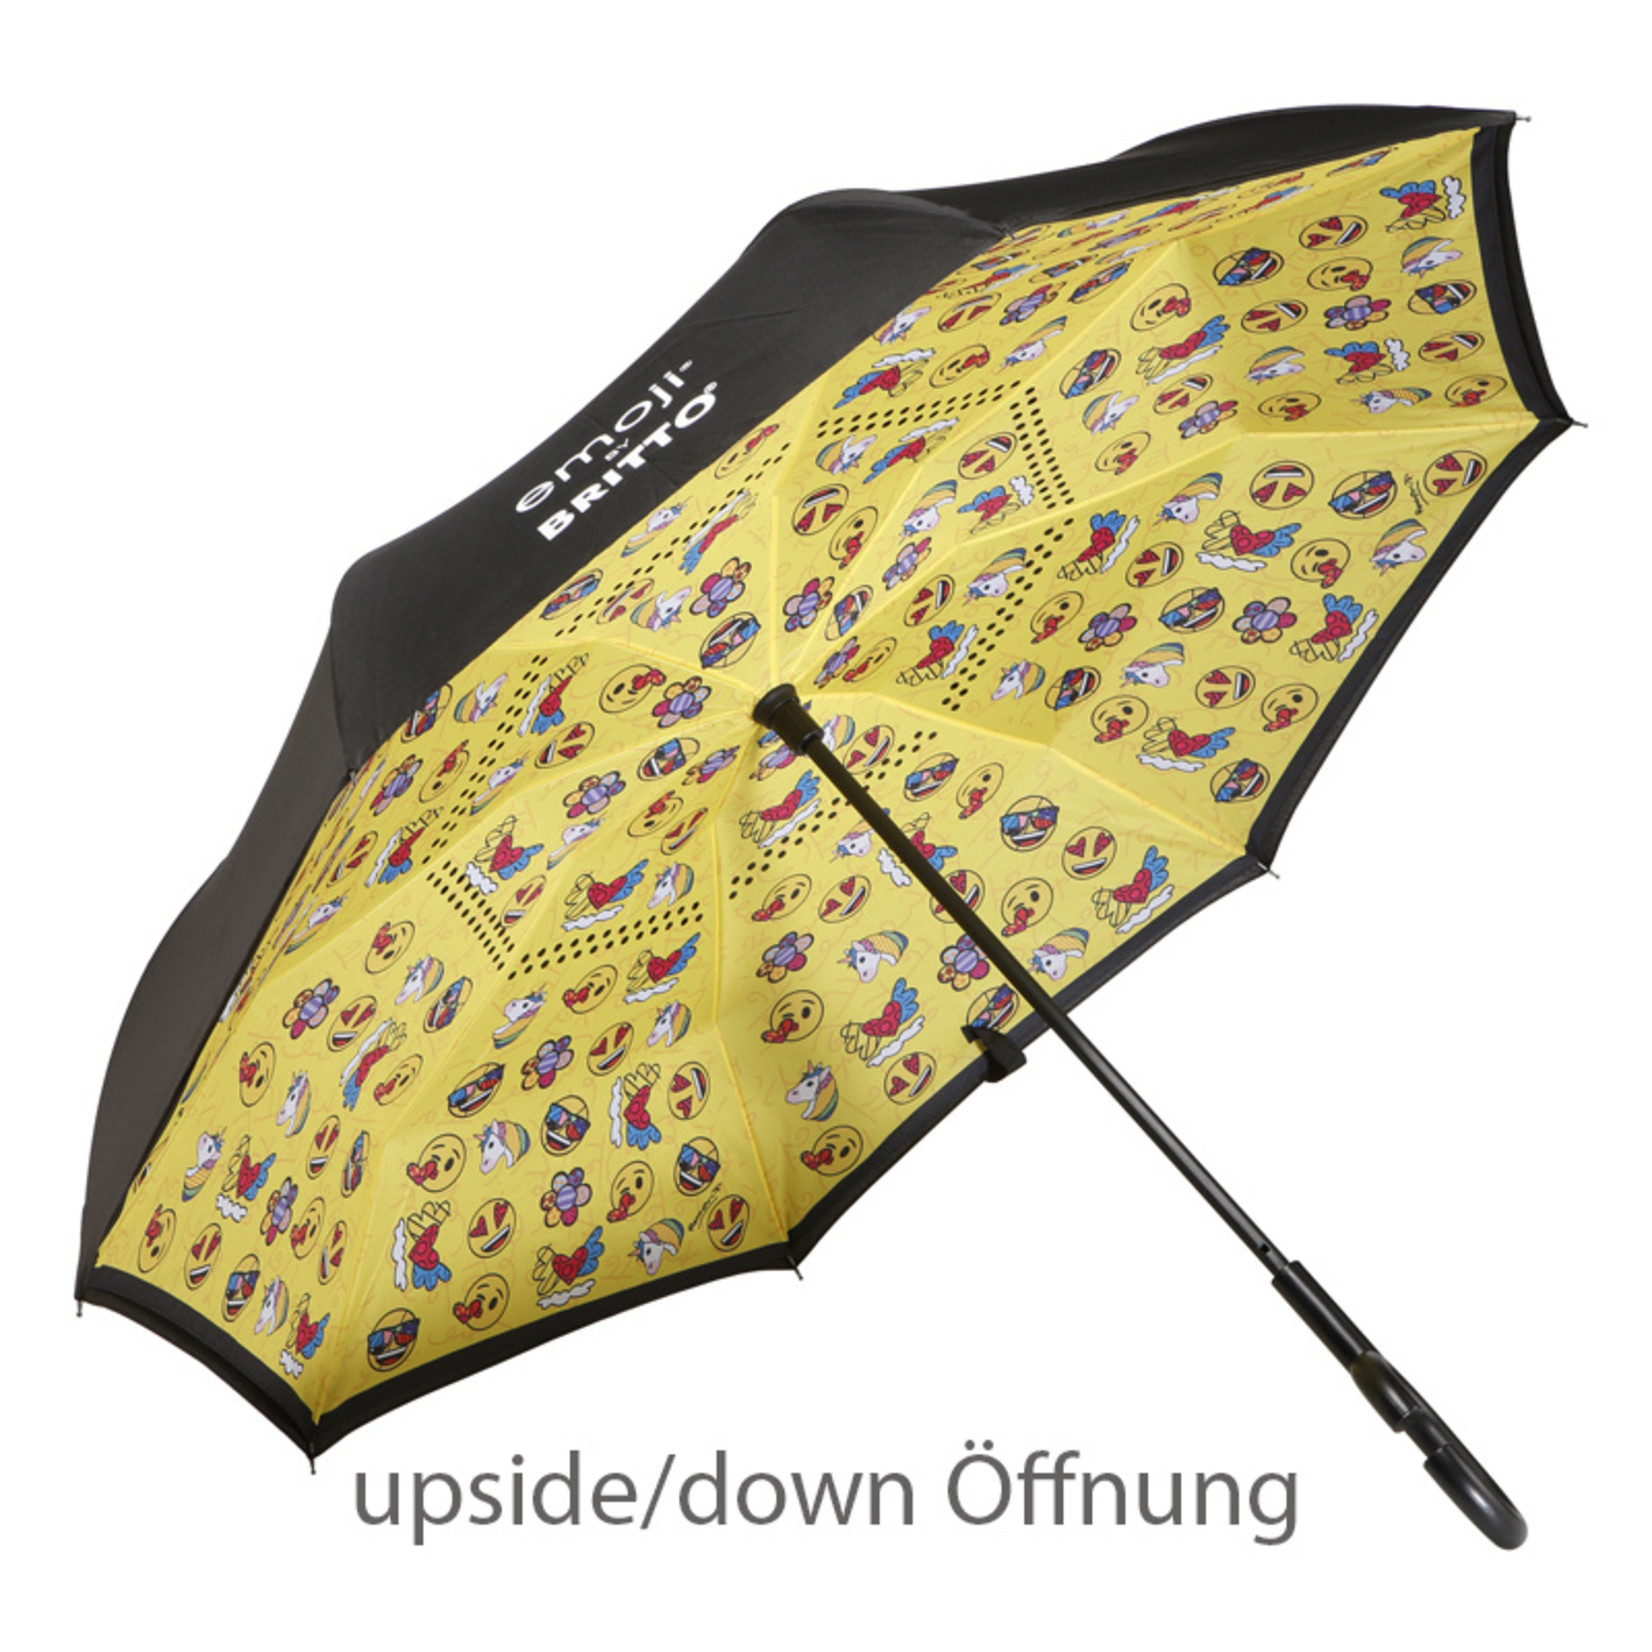 Goebel Porzellanmanufaktur Stockschirm | Romero Britto | Emojis® by Britto® | Summer Feelings